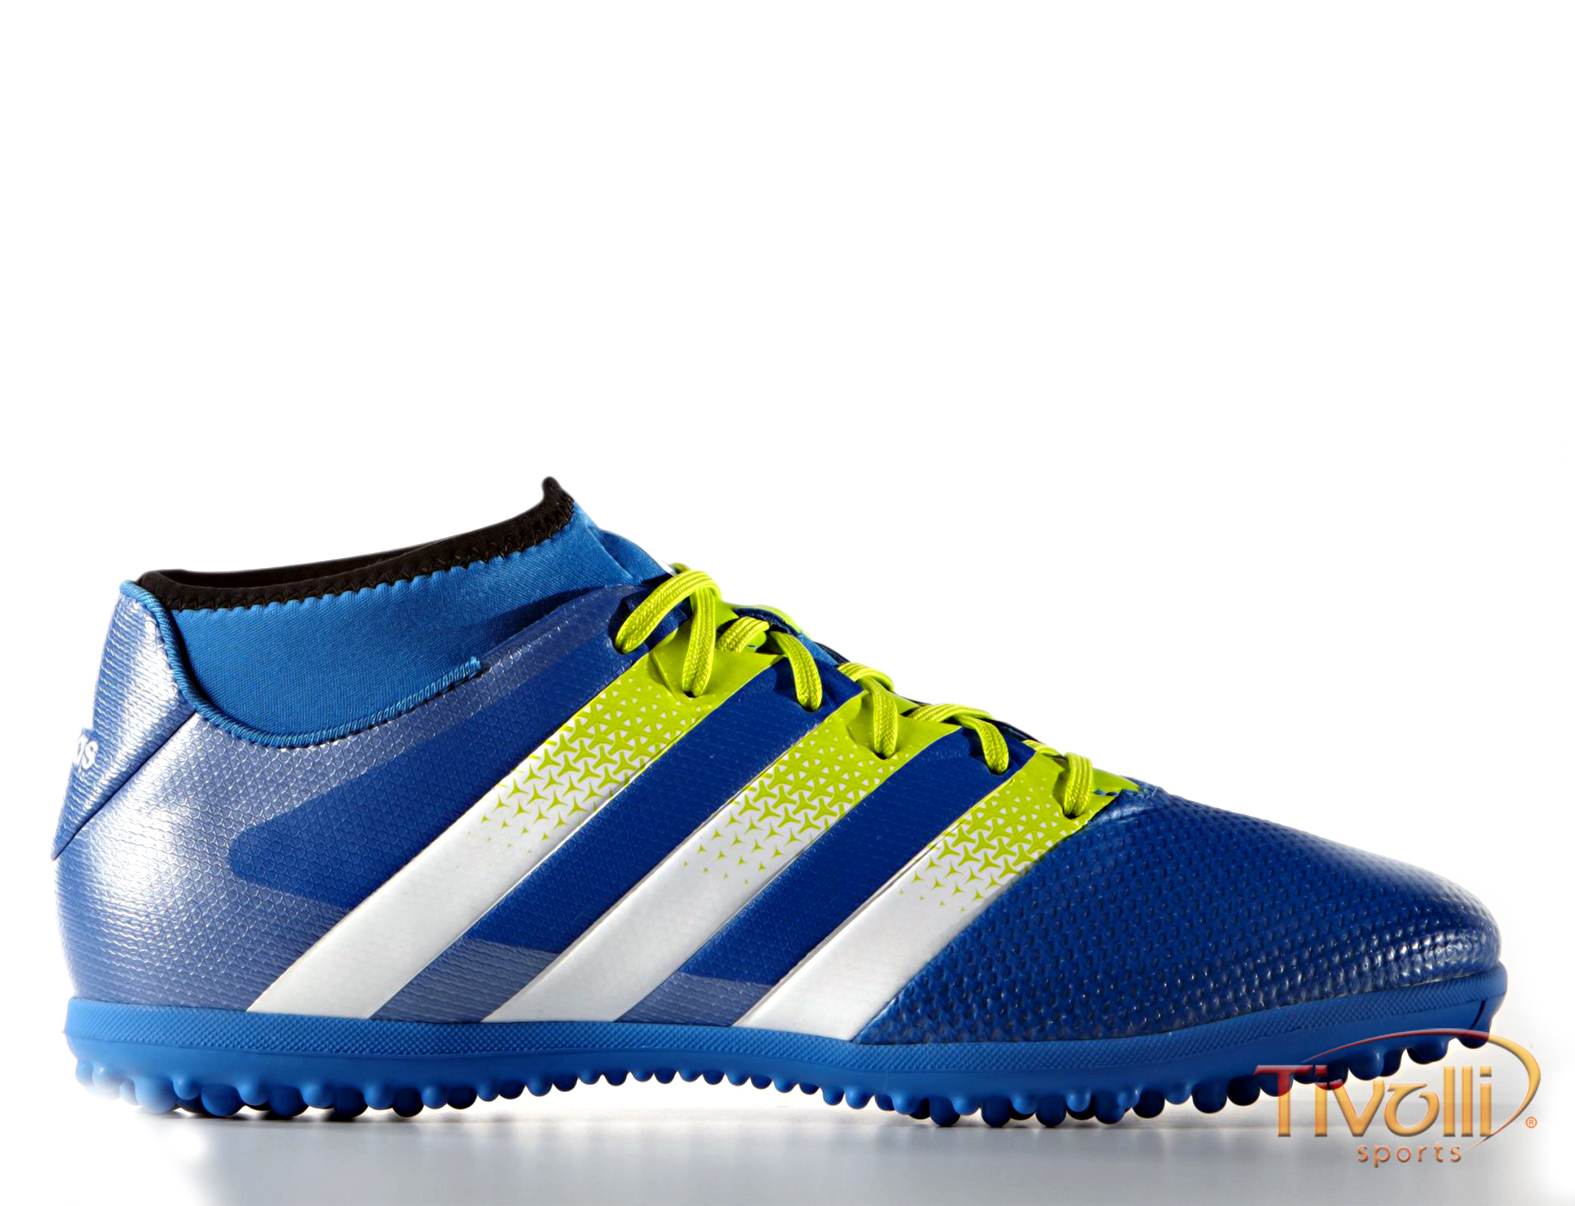 676ecfc5ea Chuteira Adidas Ace 16.3 PrimeMesh Society TF   Masculina Azul ...